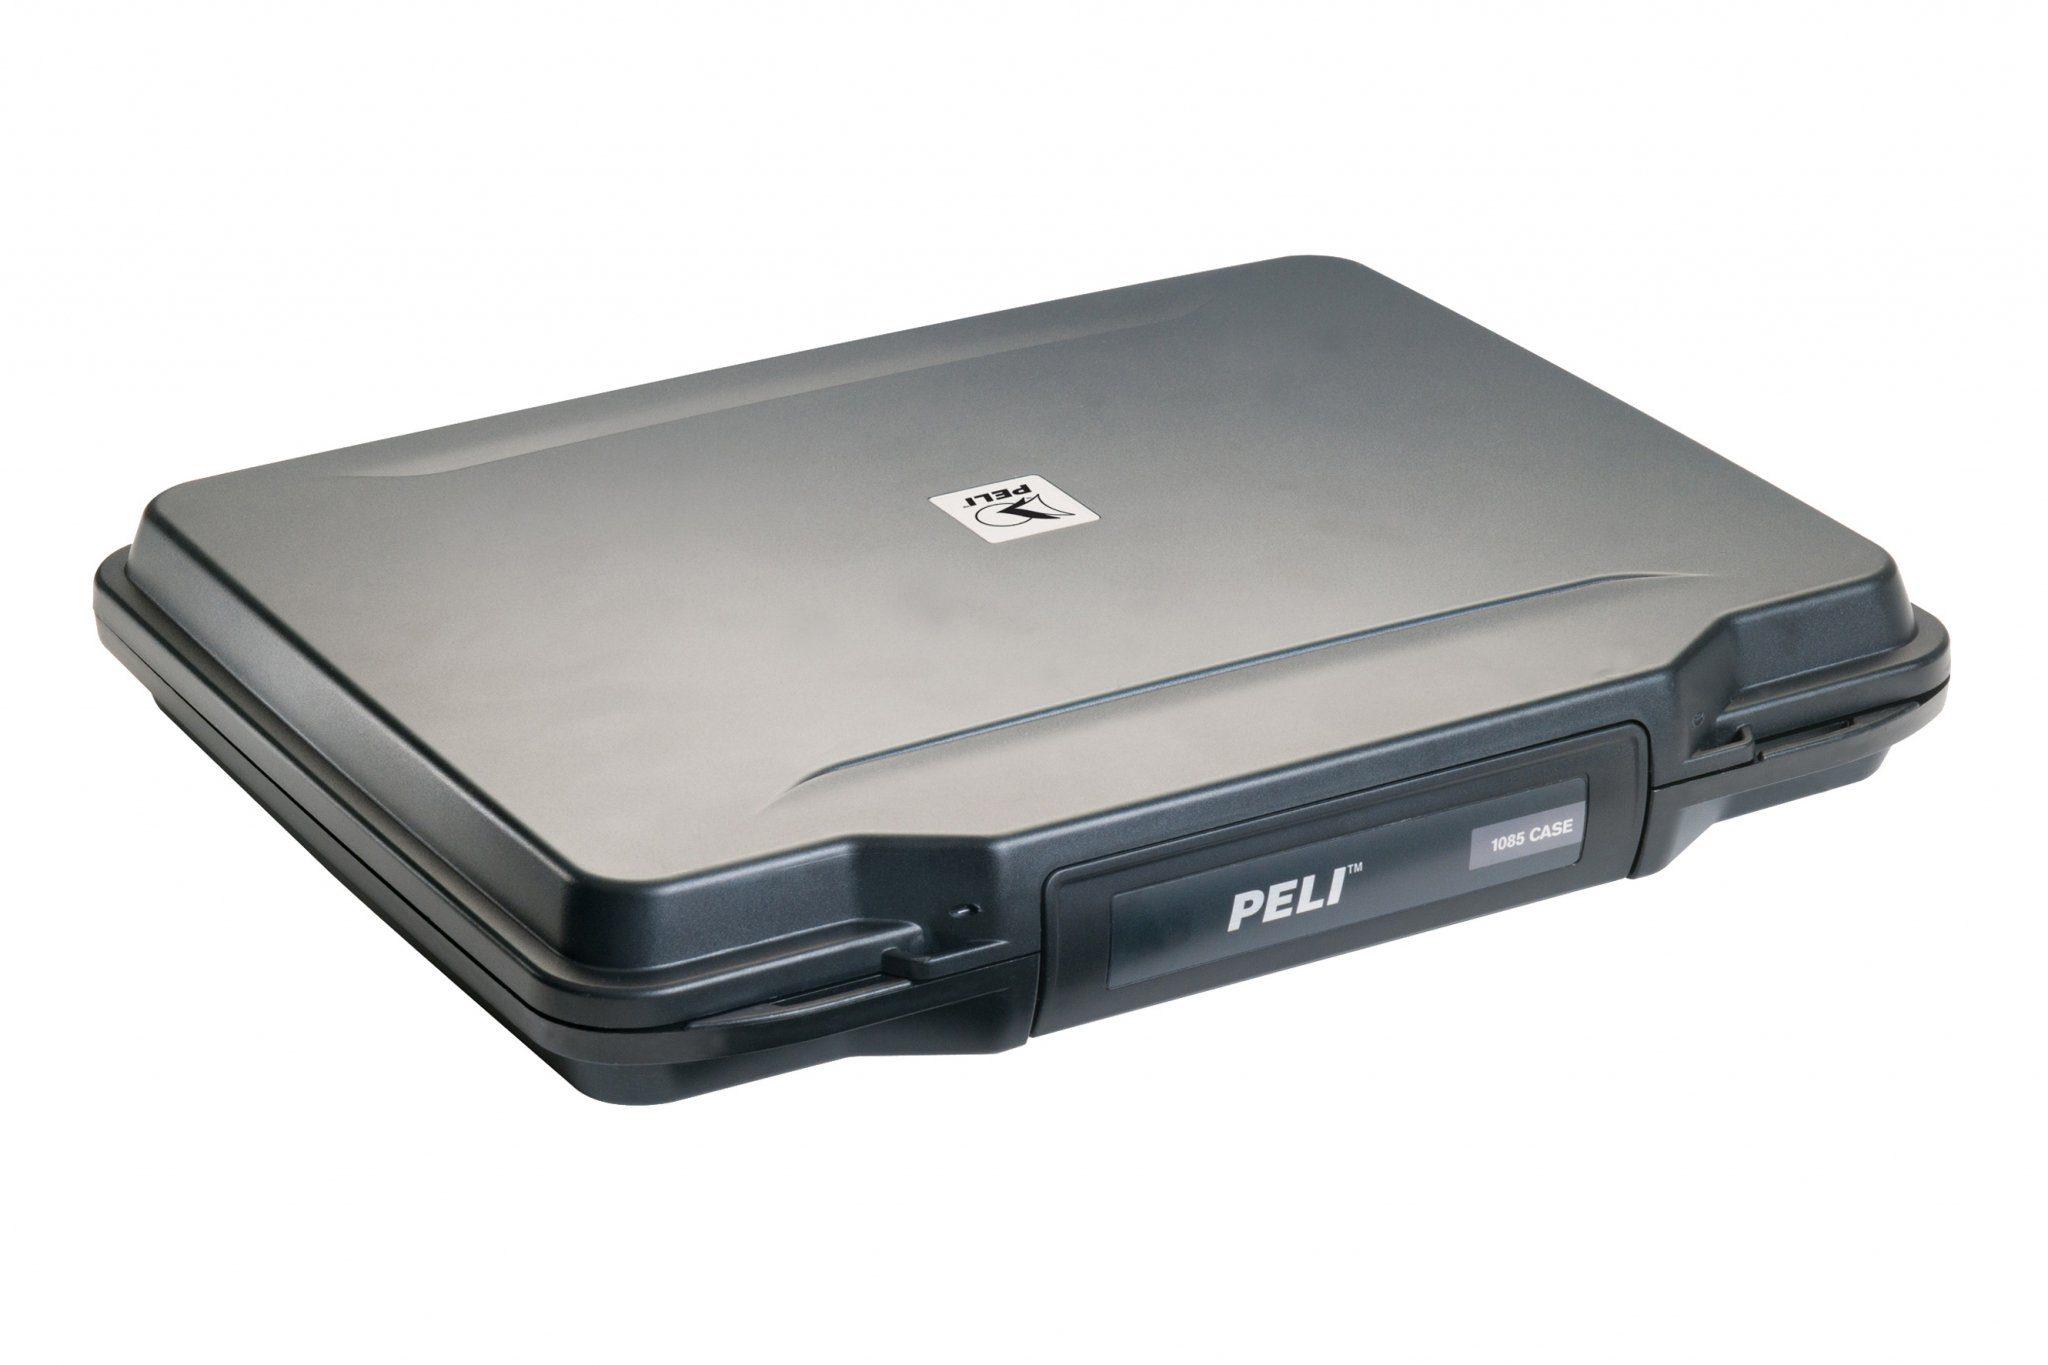 Peli Campingtruhe & -Kiste »1085 Hardback«